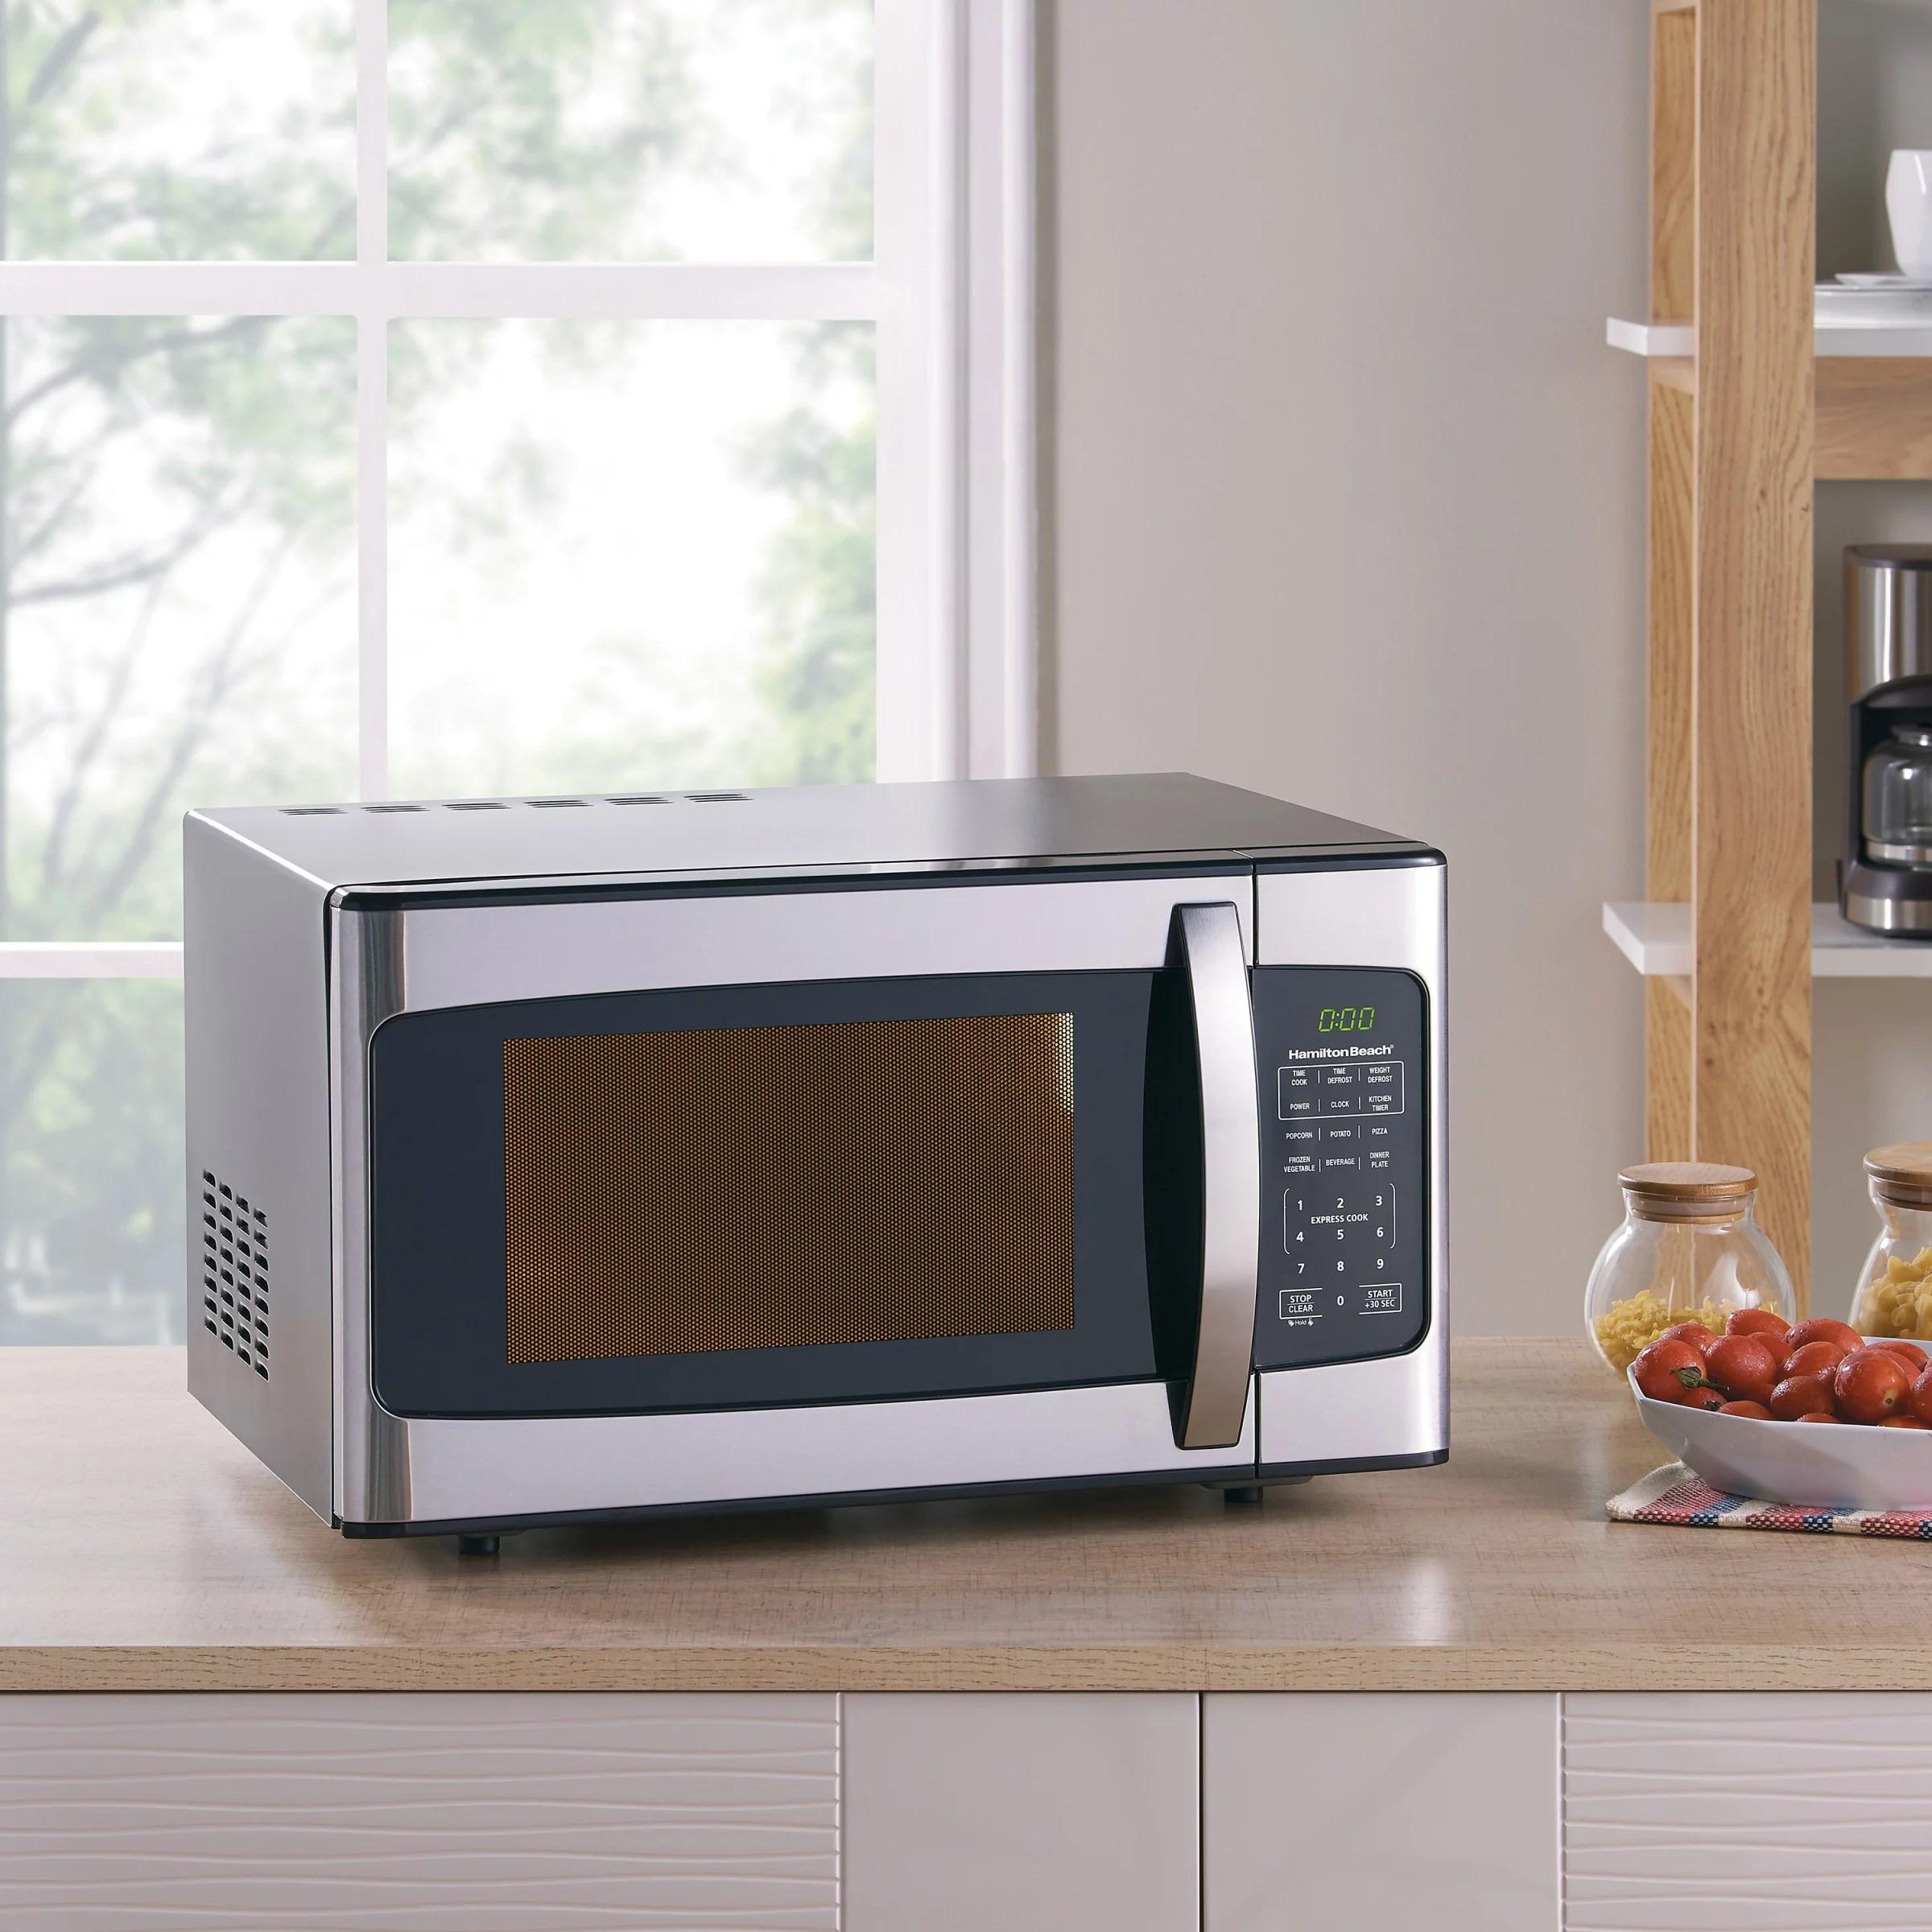 hamilton beach 1 1 cu ft 1000w stainless steel microwave